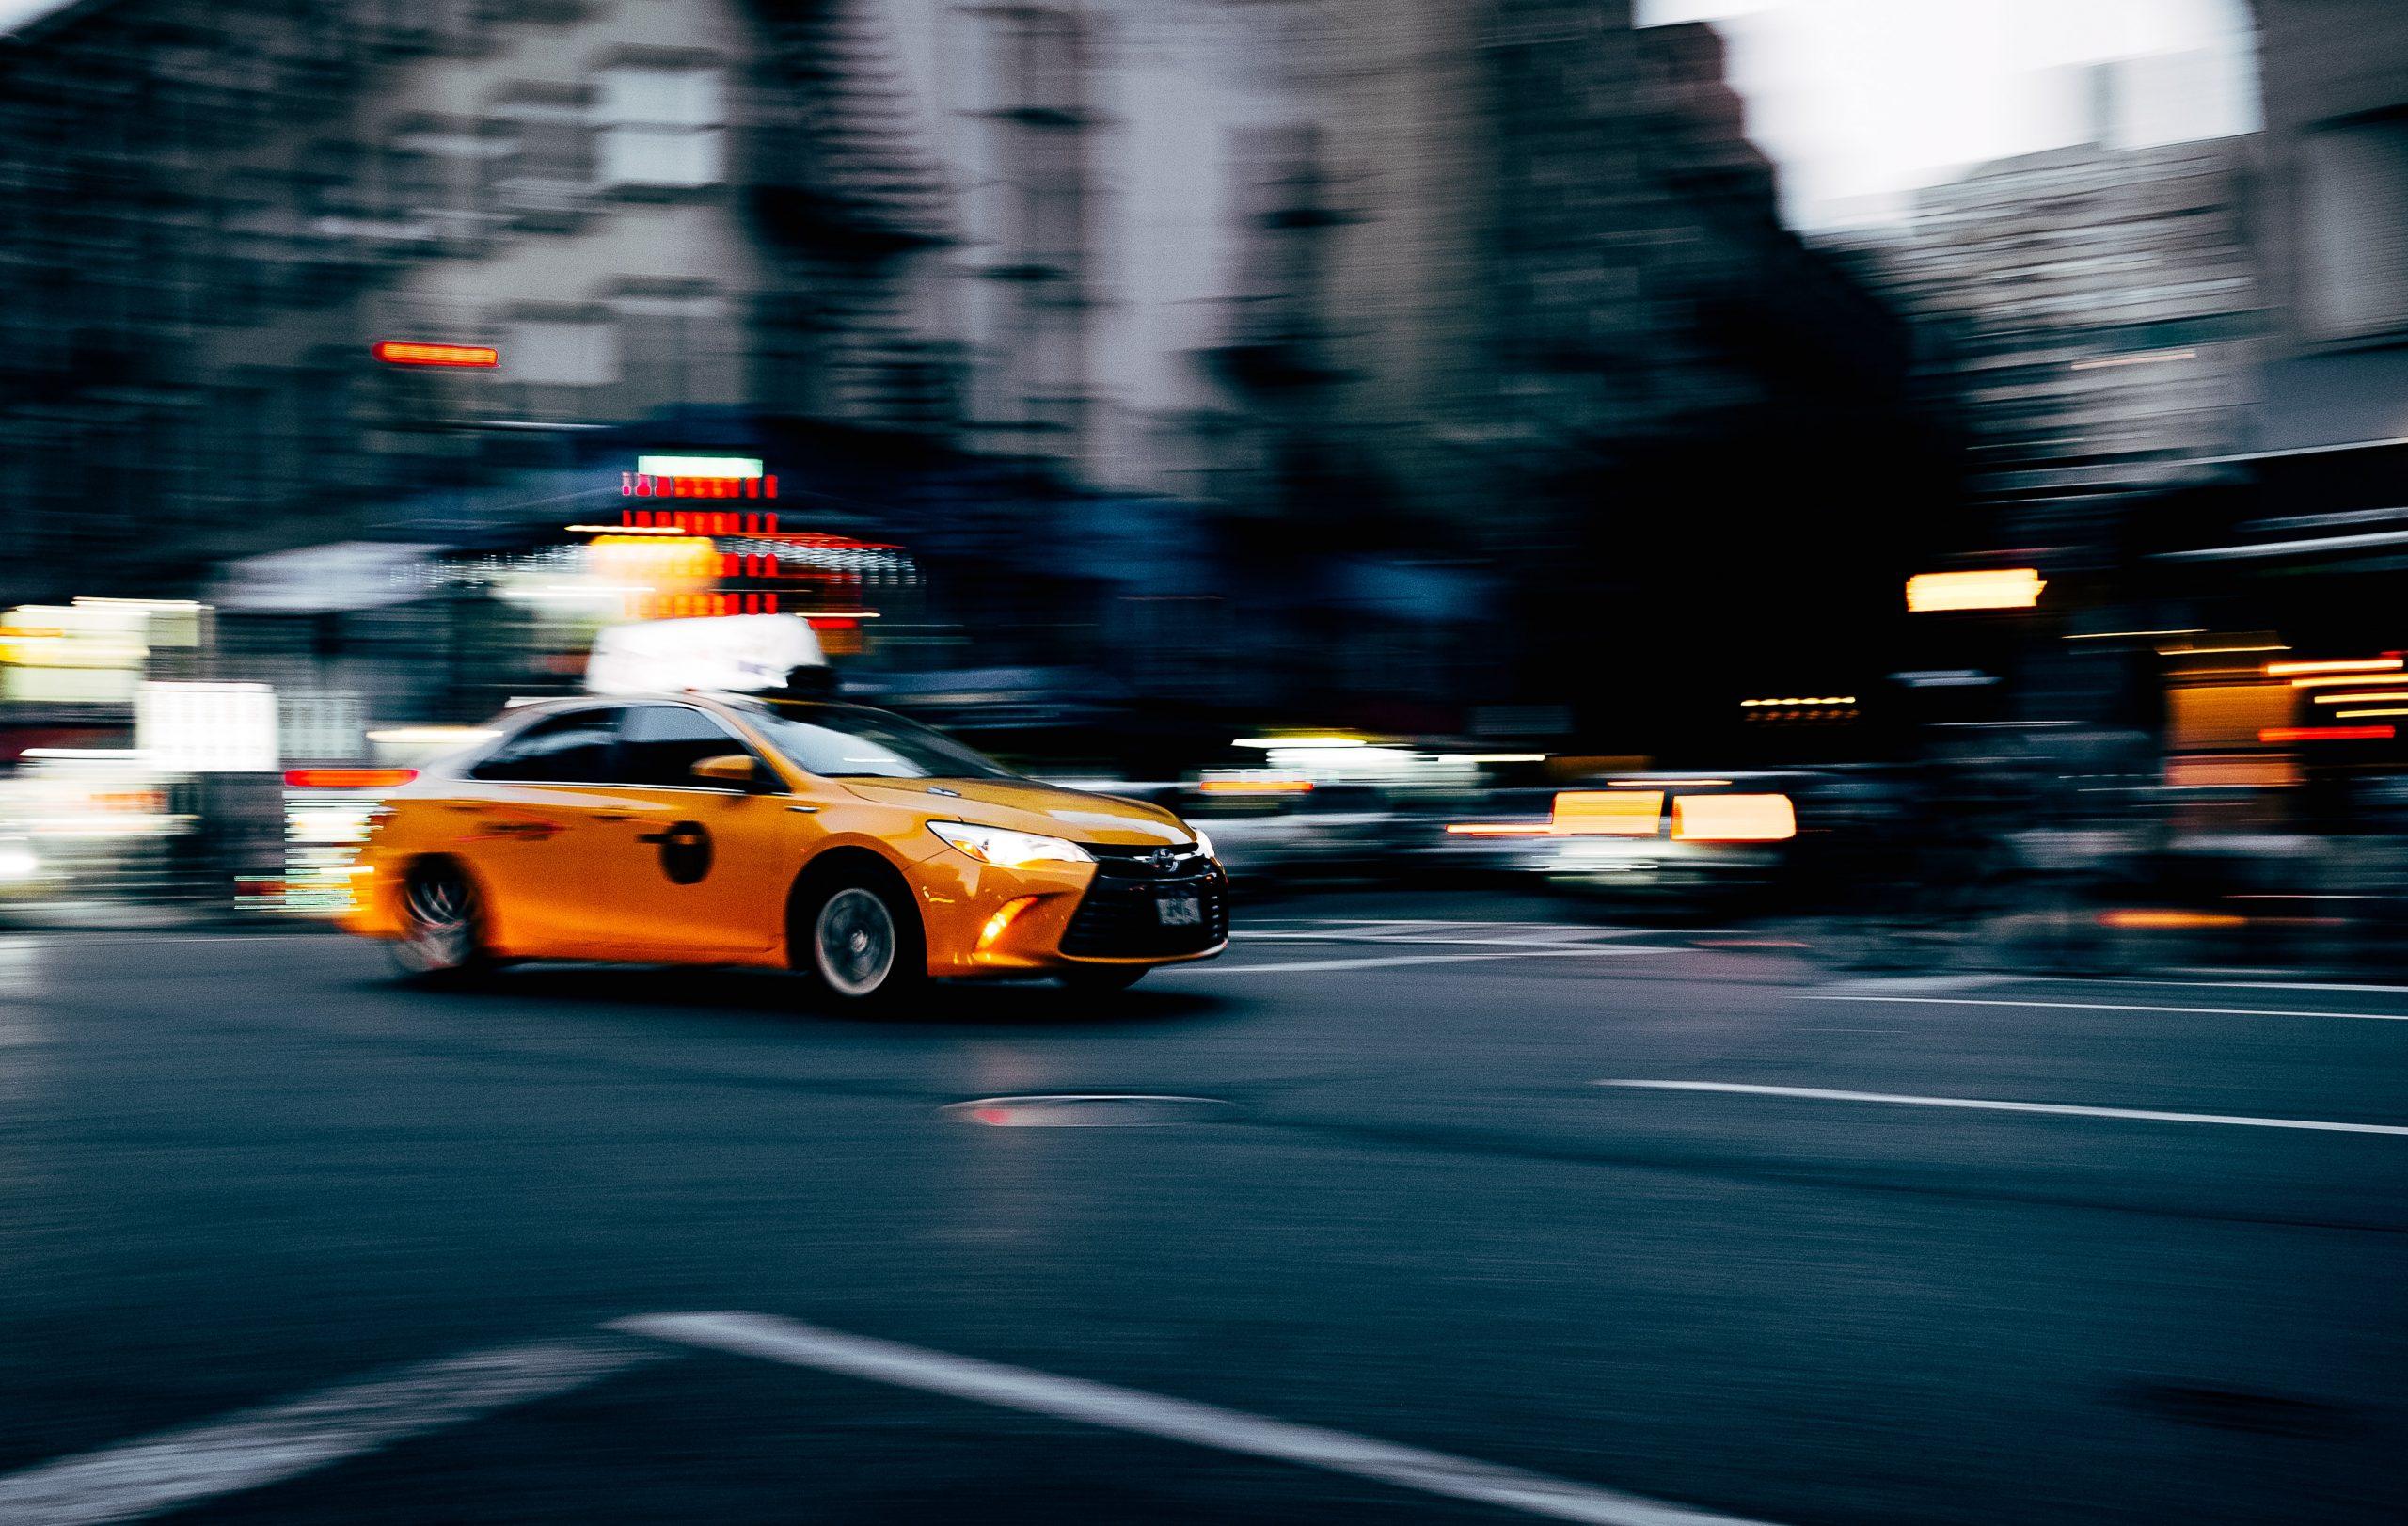 Taxi / Ambulance